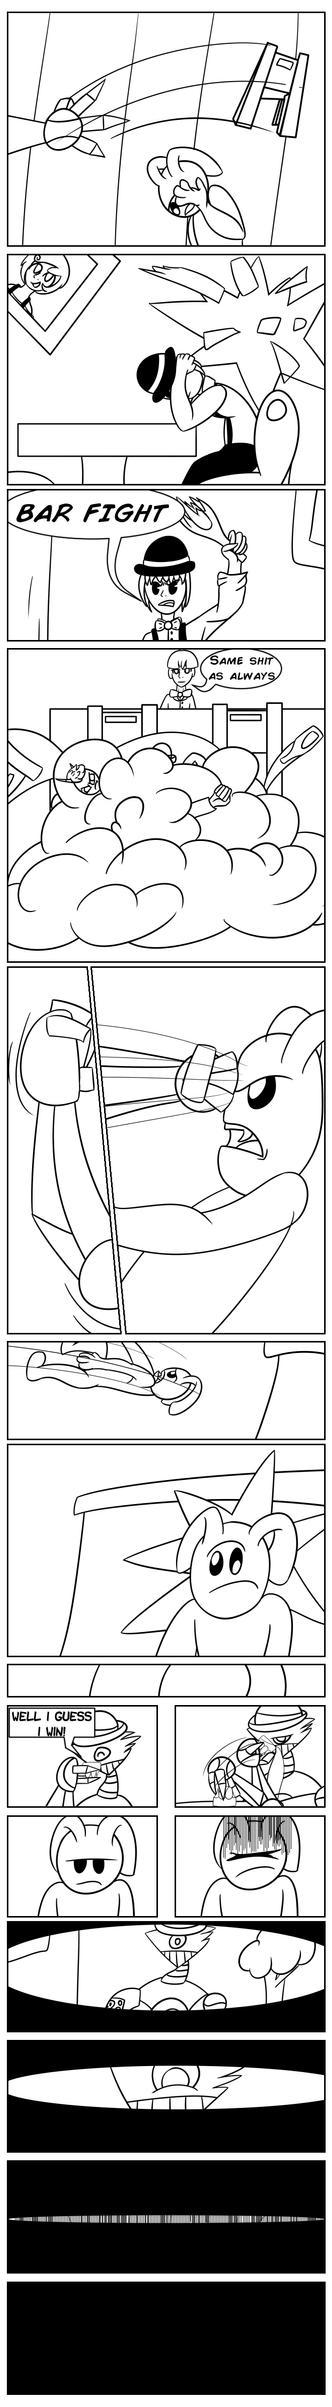 ForDisplayOCT - Round 1 - Page 5 by clayman778